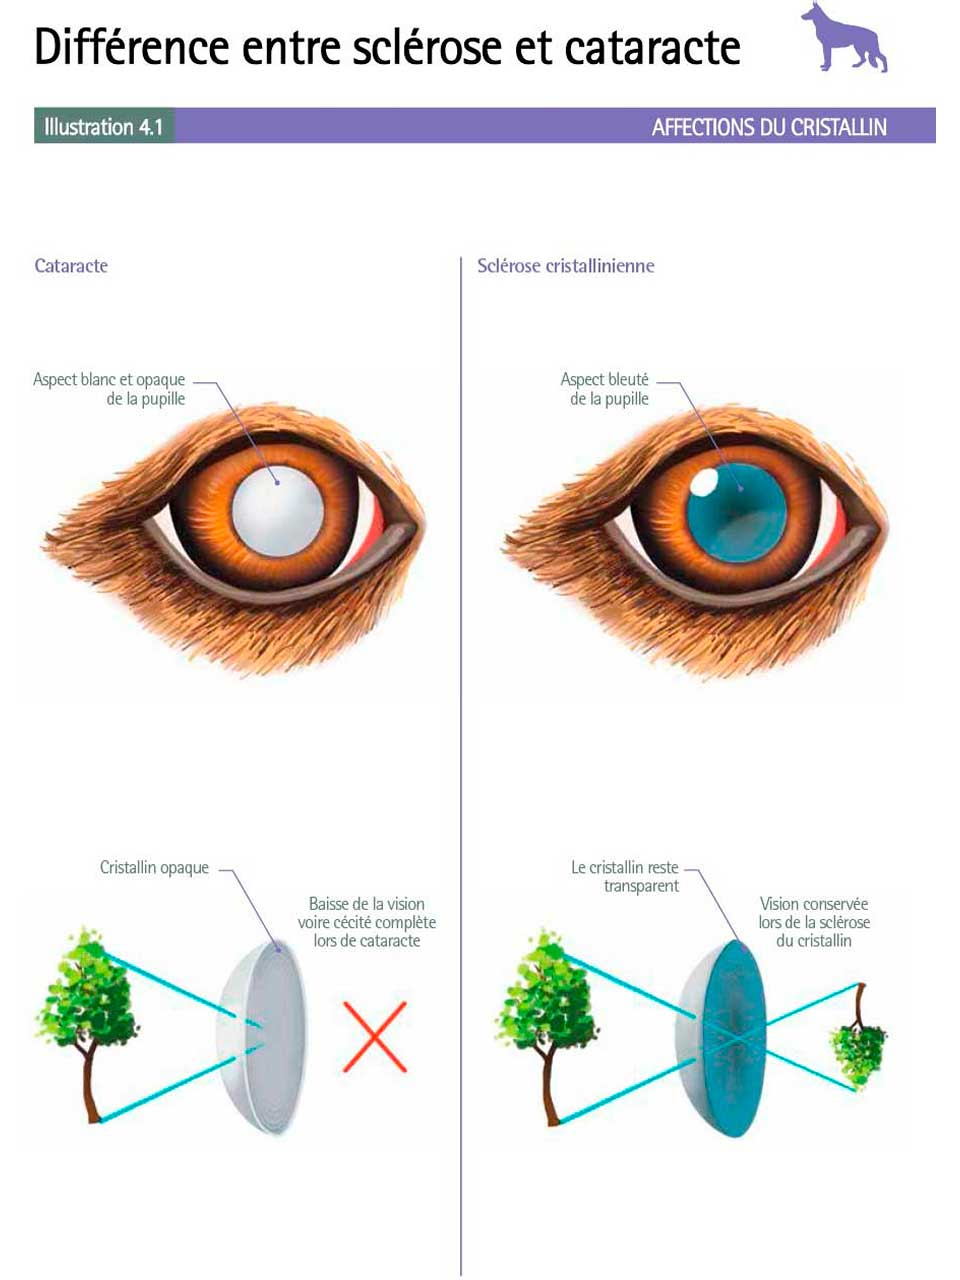 DifferenceScleroseCataracte